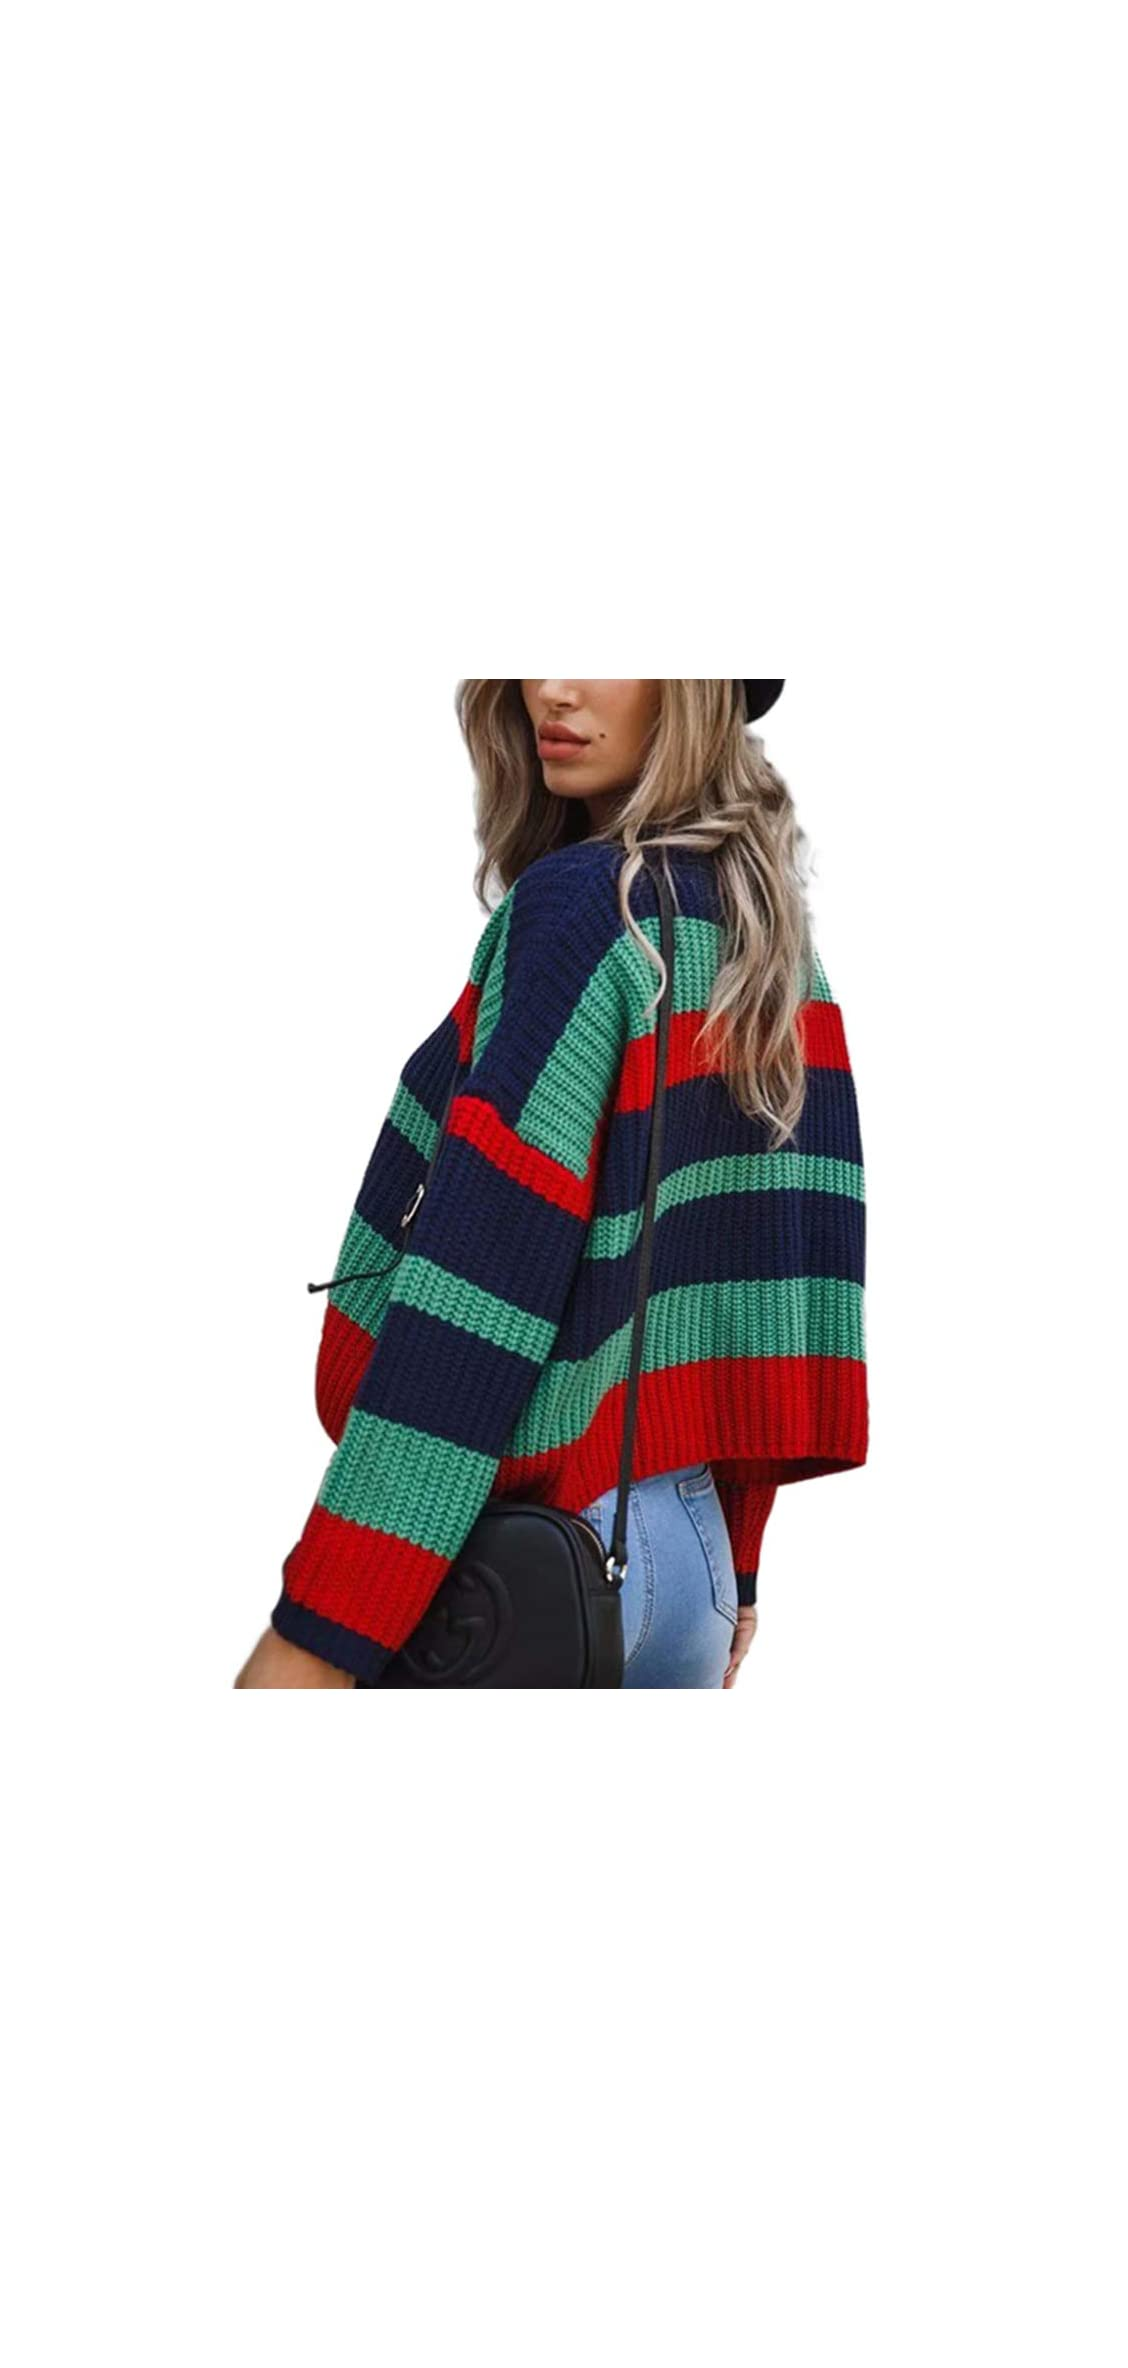 Women's Crew Neck Long Sleeve Color Block Knit Sweater